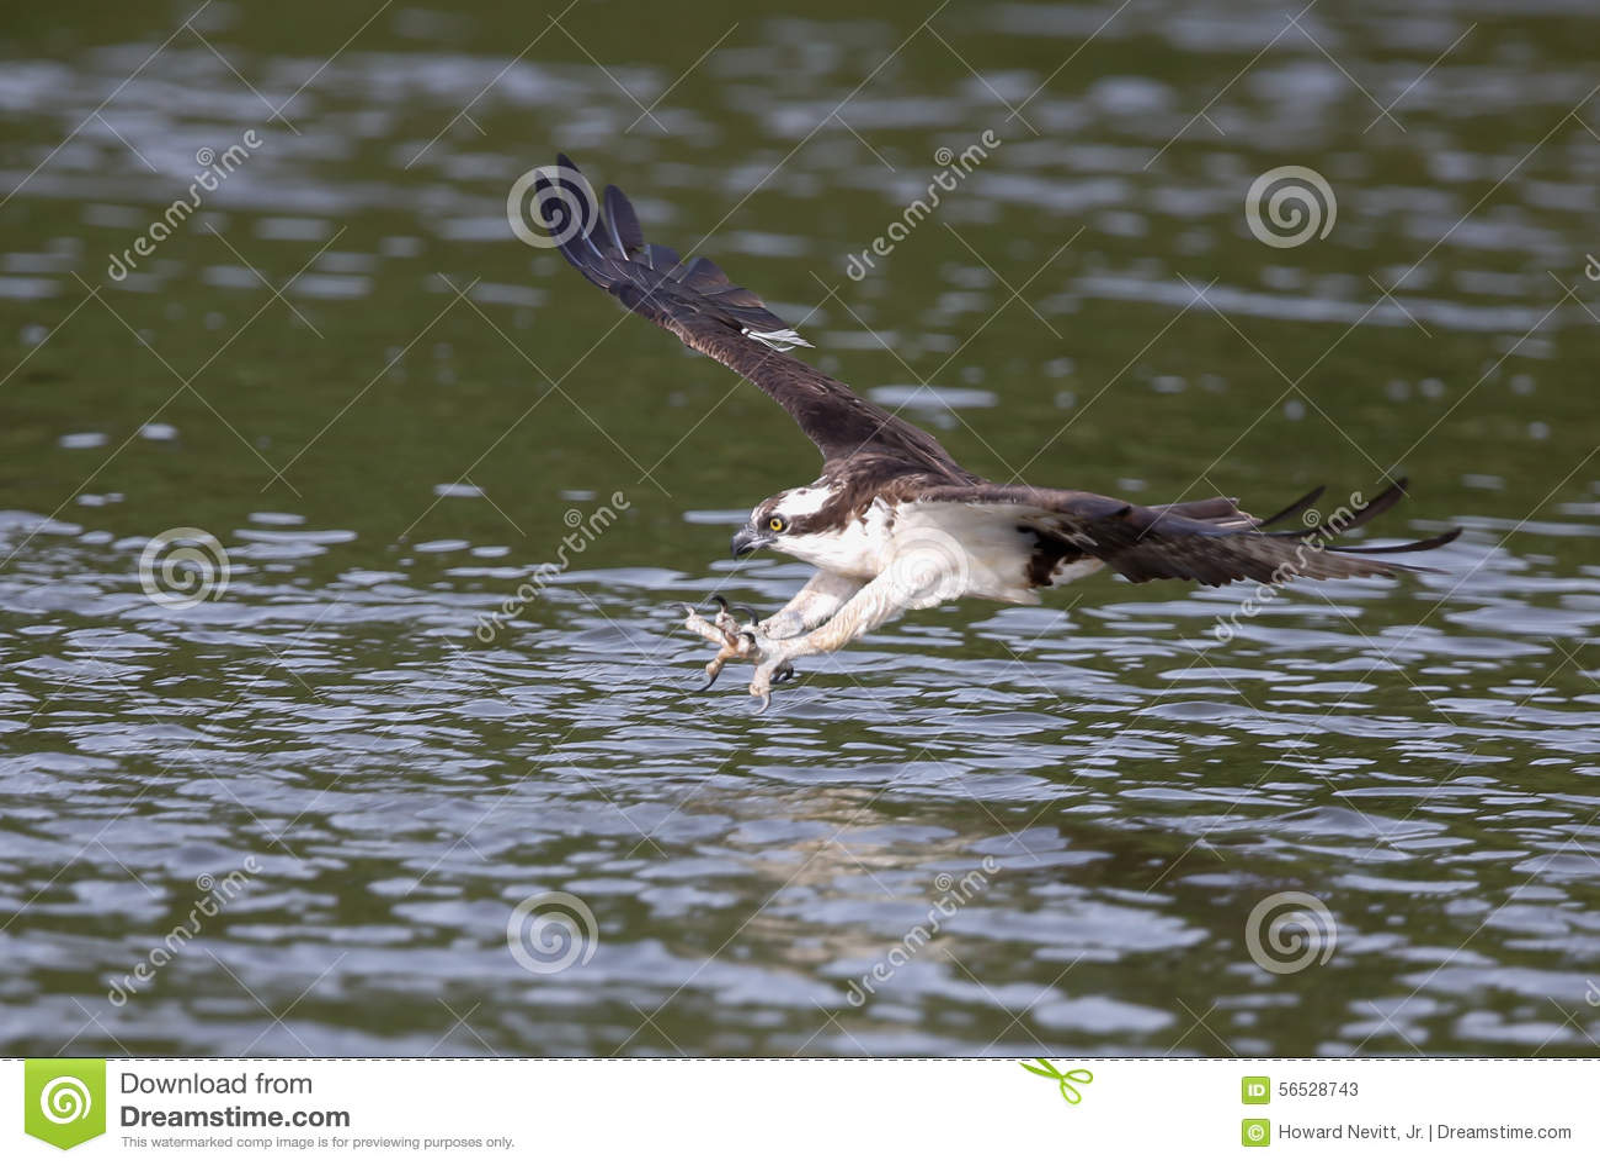 Osprey catching fish stock photo image 56528743 for Osprey catching fish